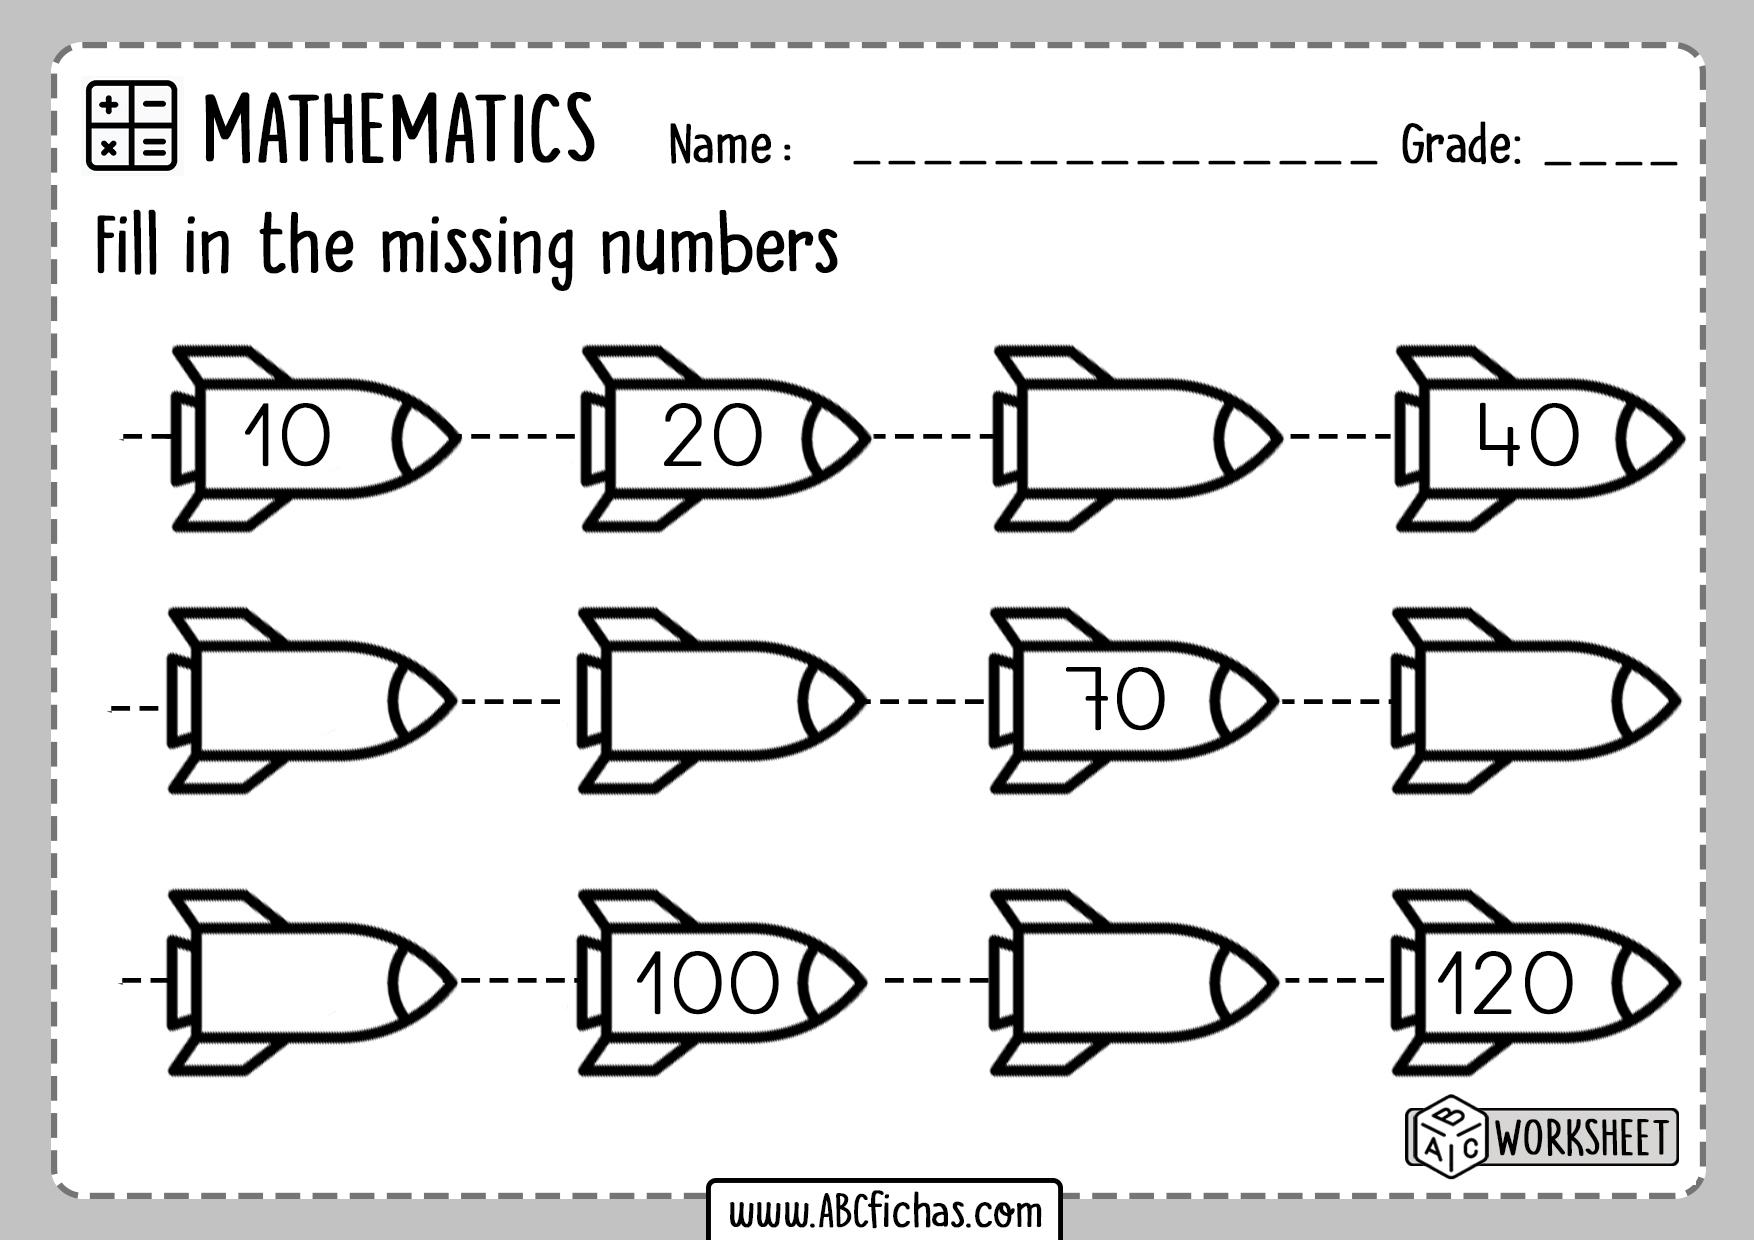 Kindergarten Number Sequence Worksheet